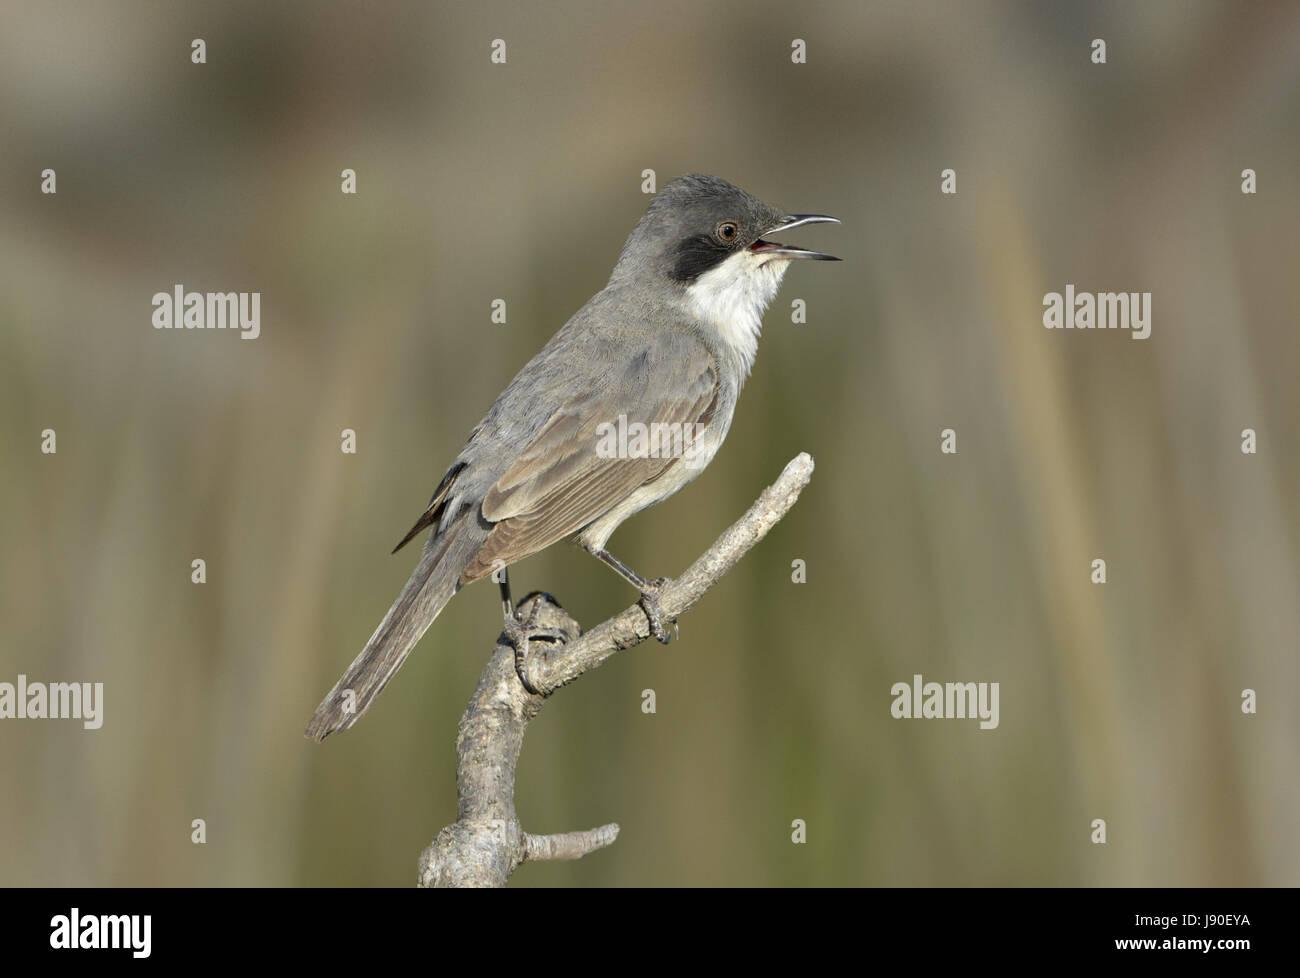 Östliche Orphean Warbler - Sylvia crassirostris Stockbild